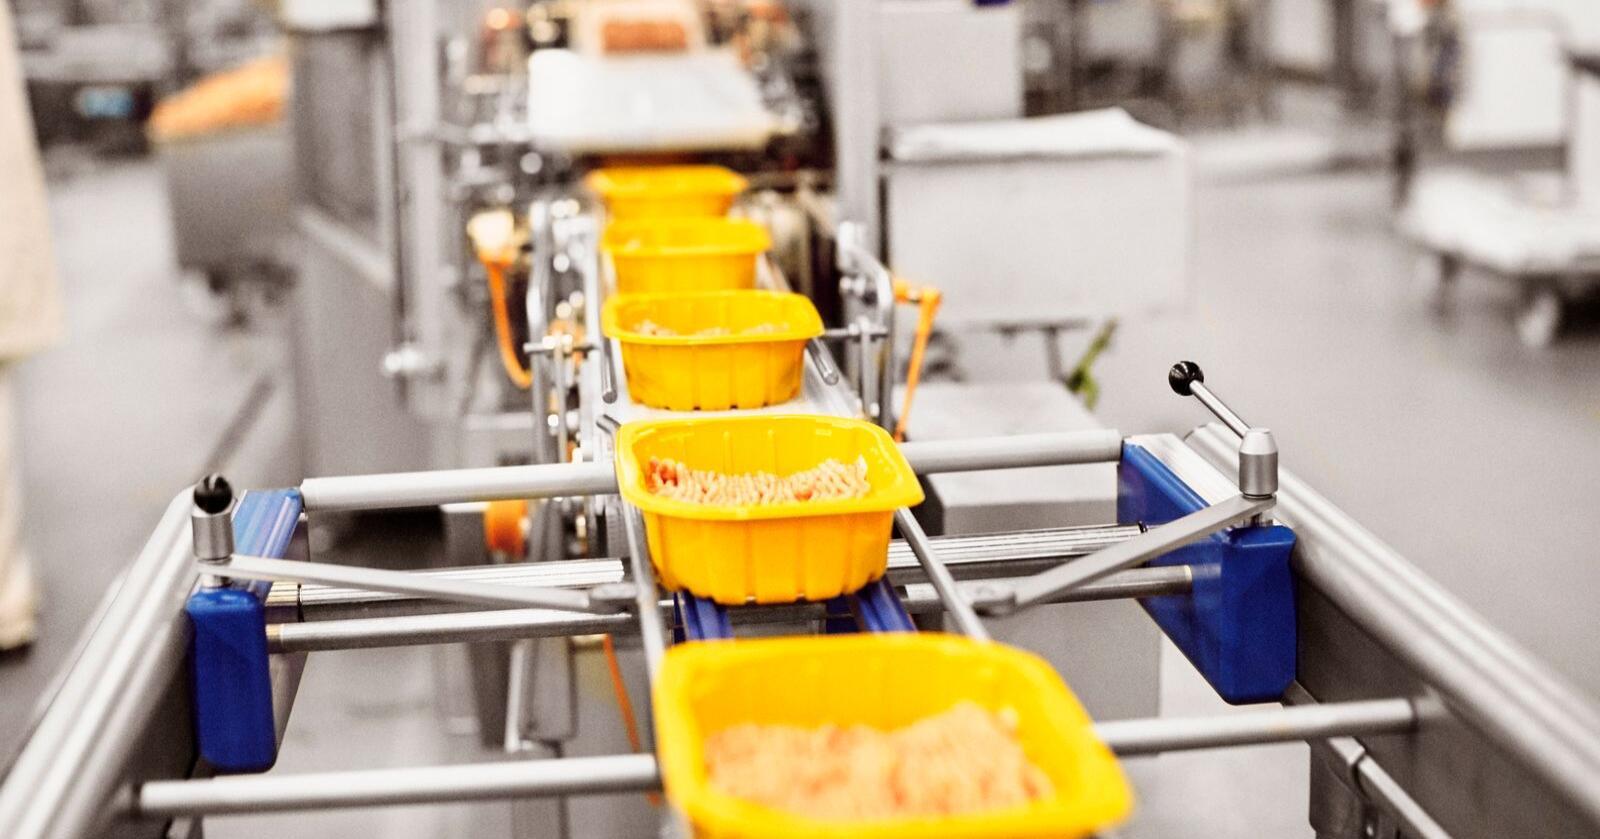 Priors nye kyllingskåler består av 95 prosent resirkulert materiale fra plastflasker. Bildet viser Nortura Hærland. (Foto: Øivind Haug)